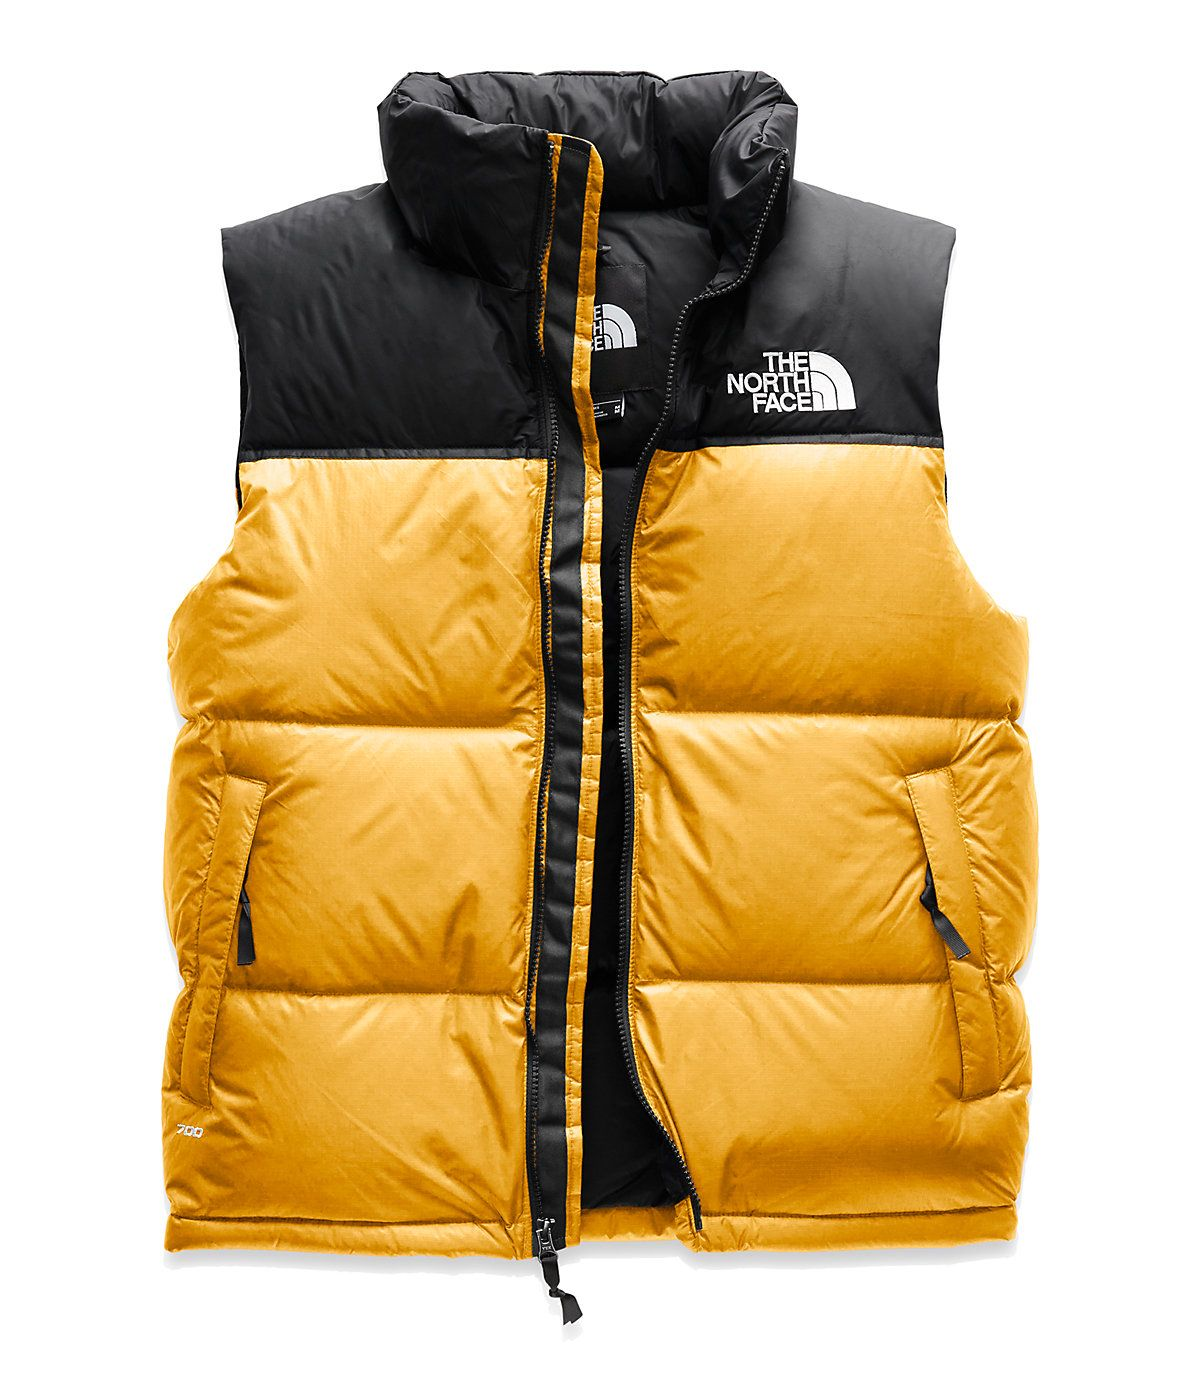 Men S 1996 Retro Nuptse Vest Free Shipping The North Face Yellow Vest Mens The North Face 1996 The North Face 1996 Retro Nuptse [ 1396 x 1200 Pixel ]